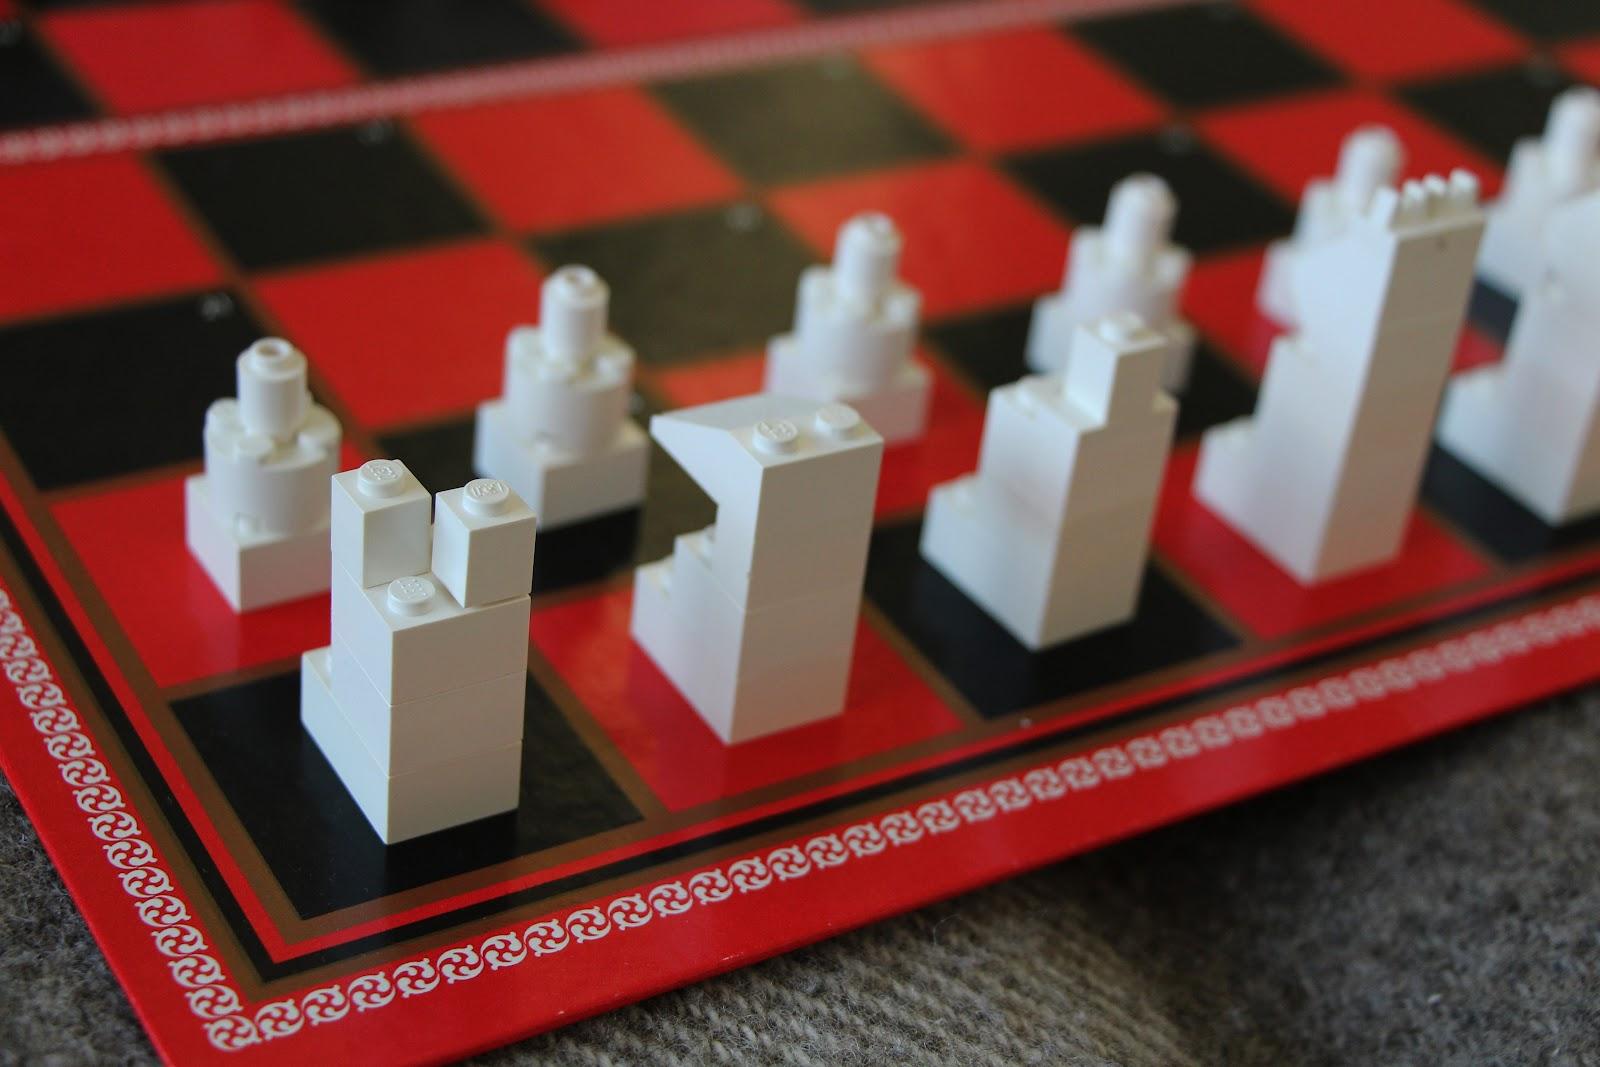 The Contemplative Creative Simple Lego Chess Set